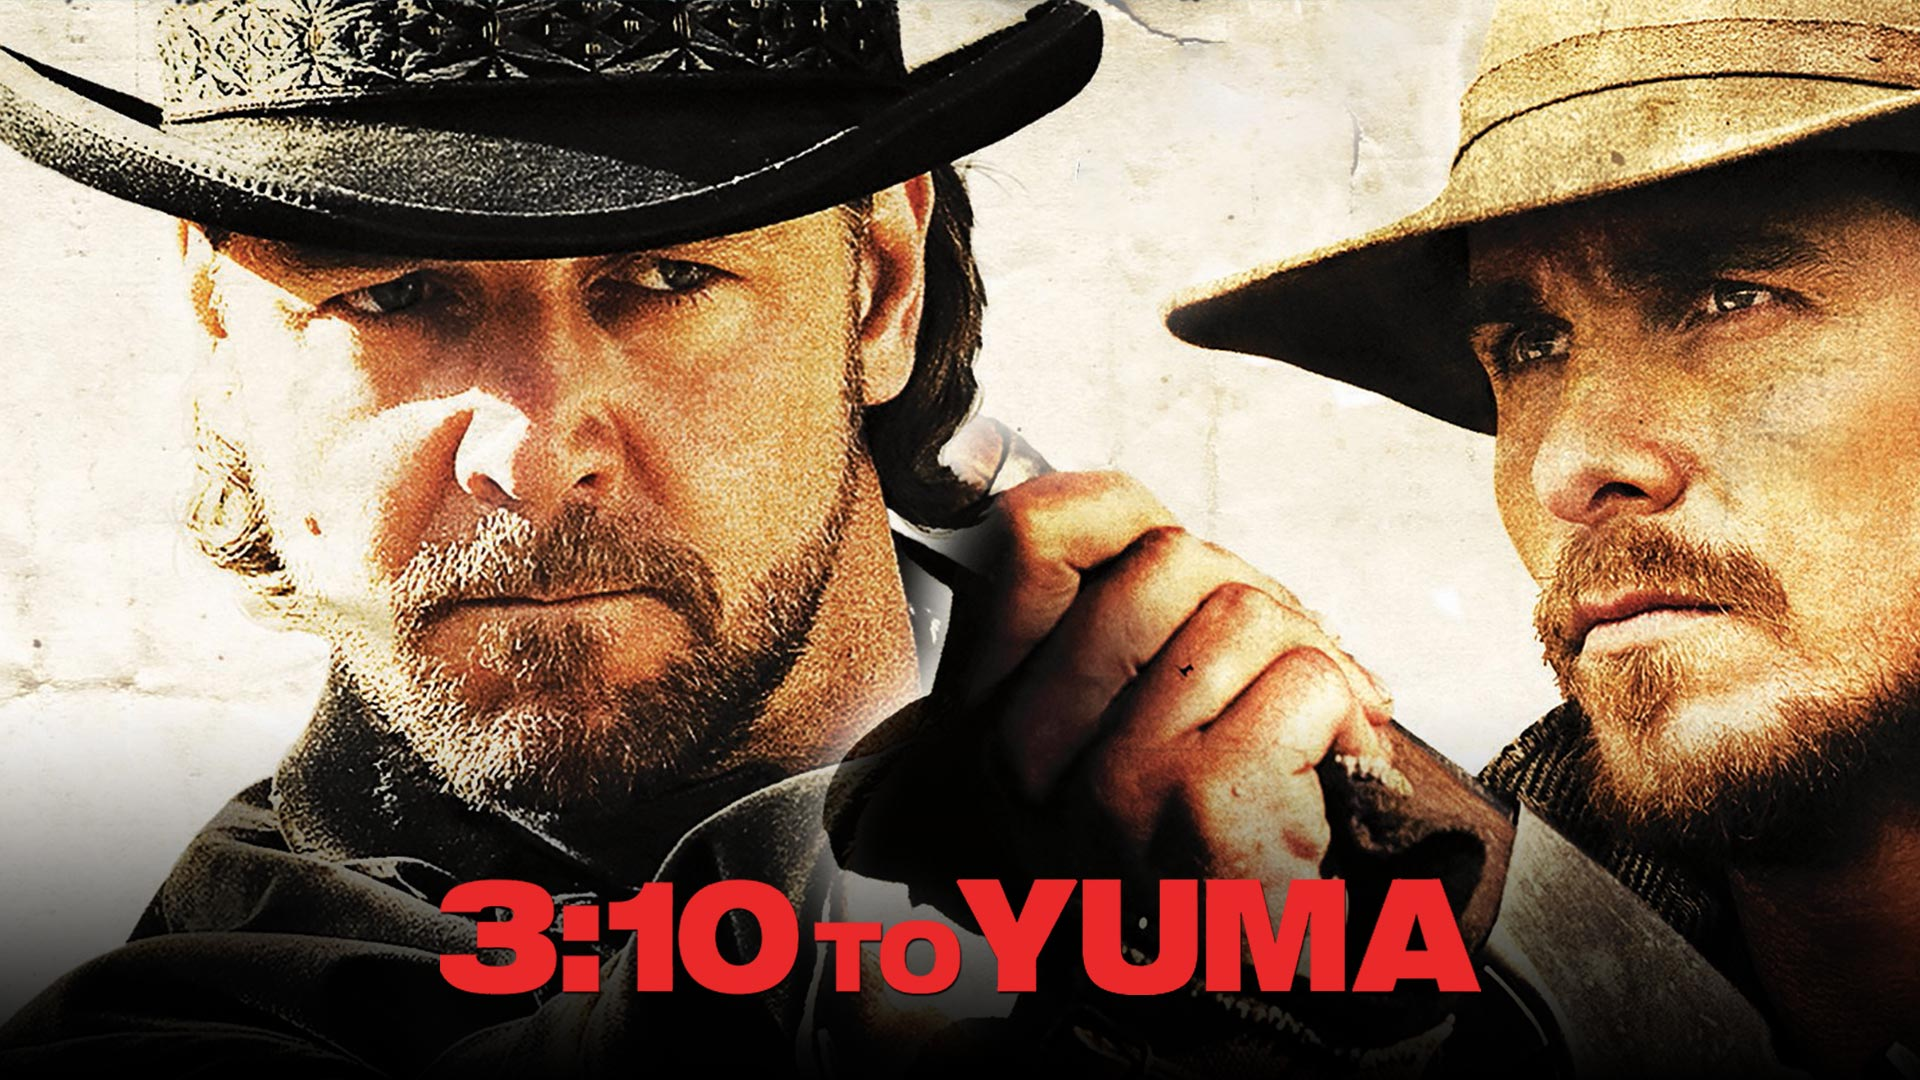 3:10 To Yuma (4K UHD)